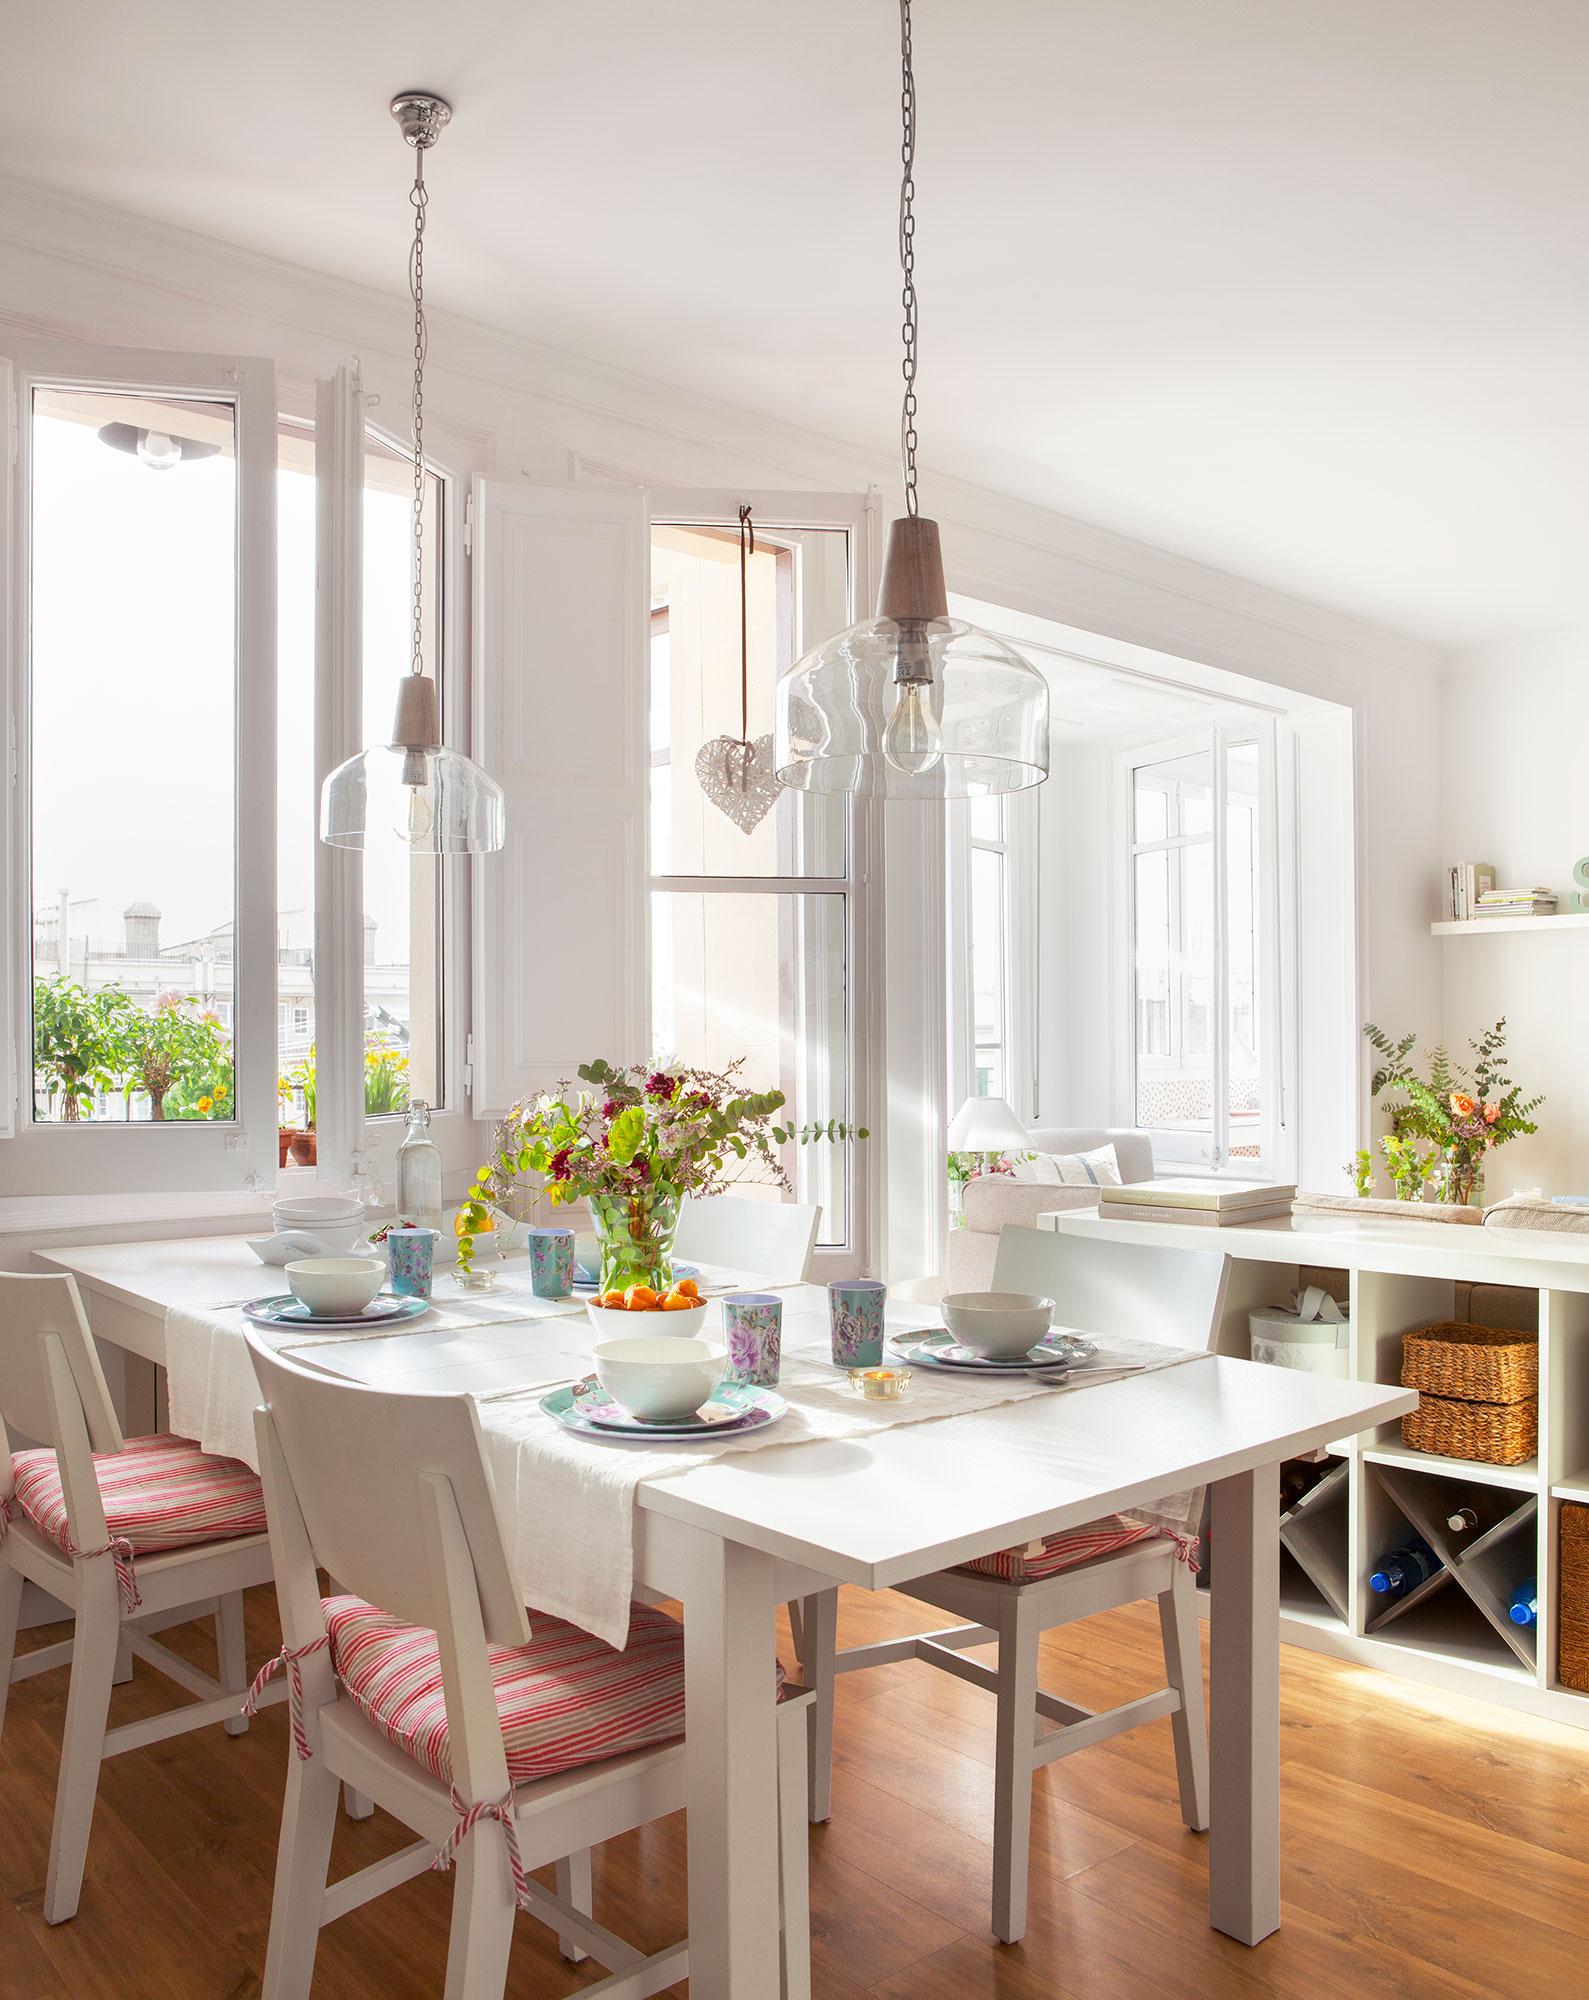 Mesas de comedor: cómo elegir tu mesa de comedor perfecta